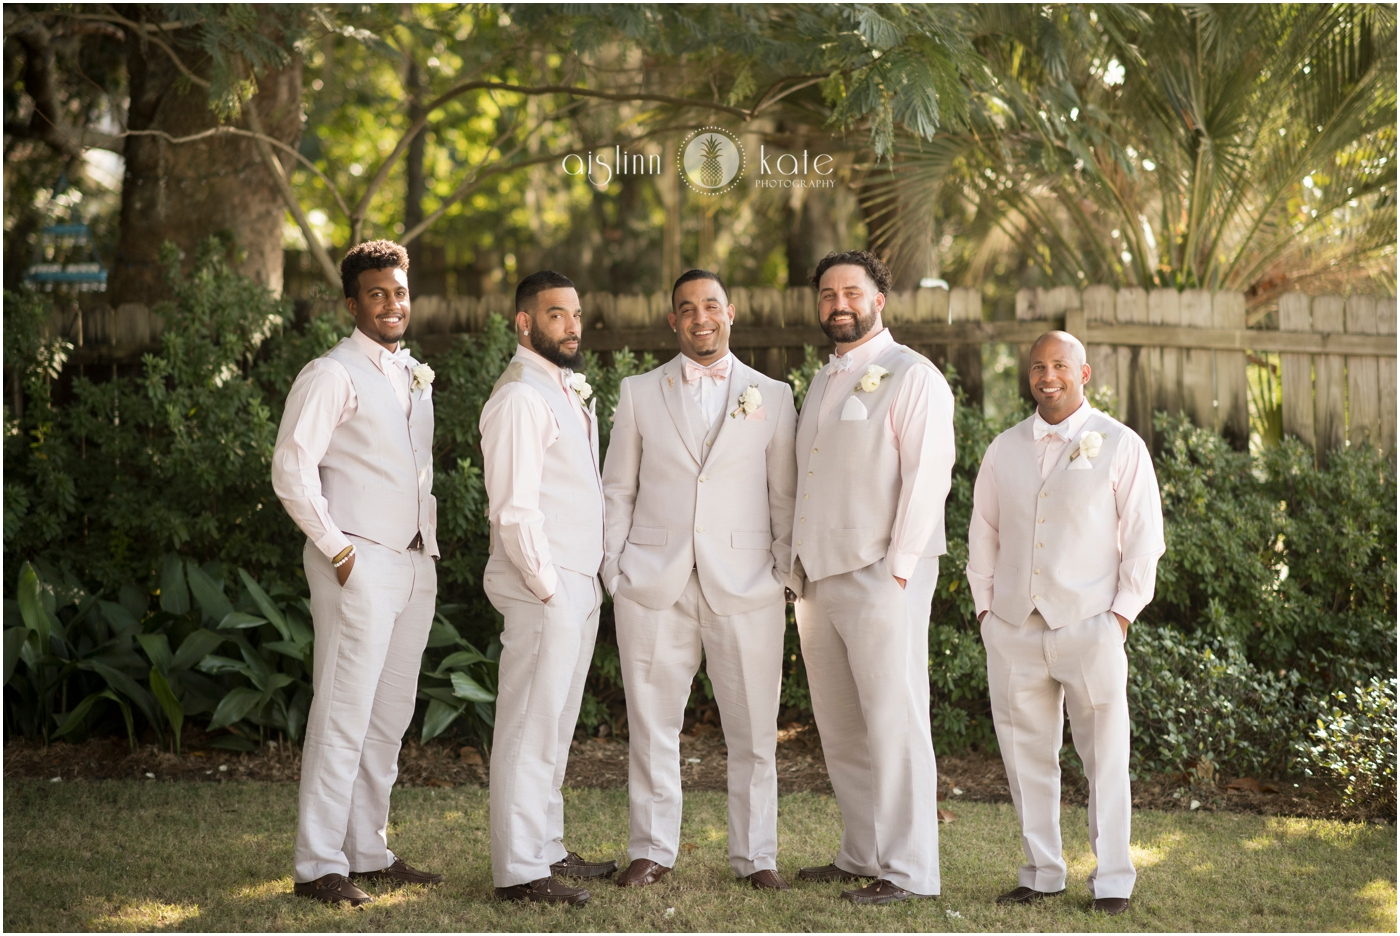 Pensacola-Destin-Wedding-Photographer_8735.jpg